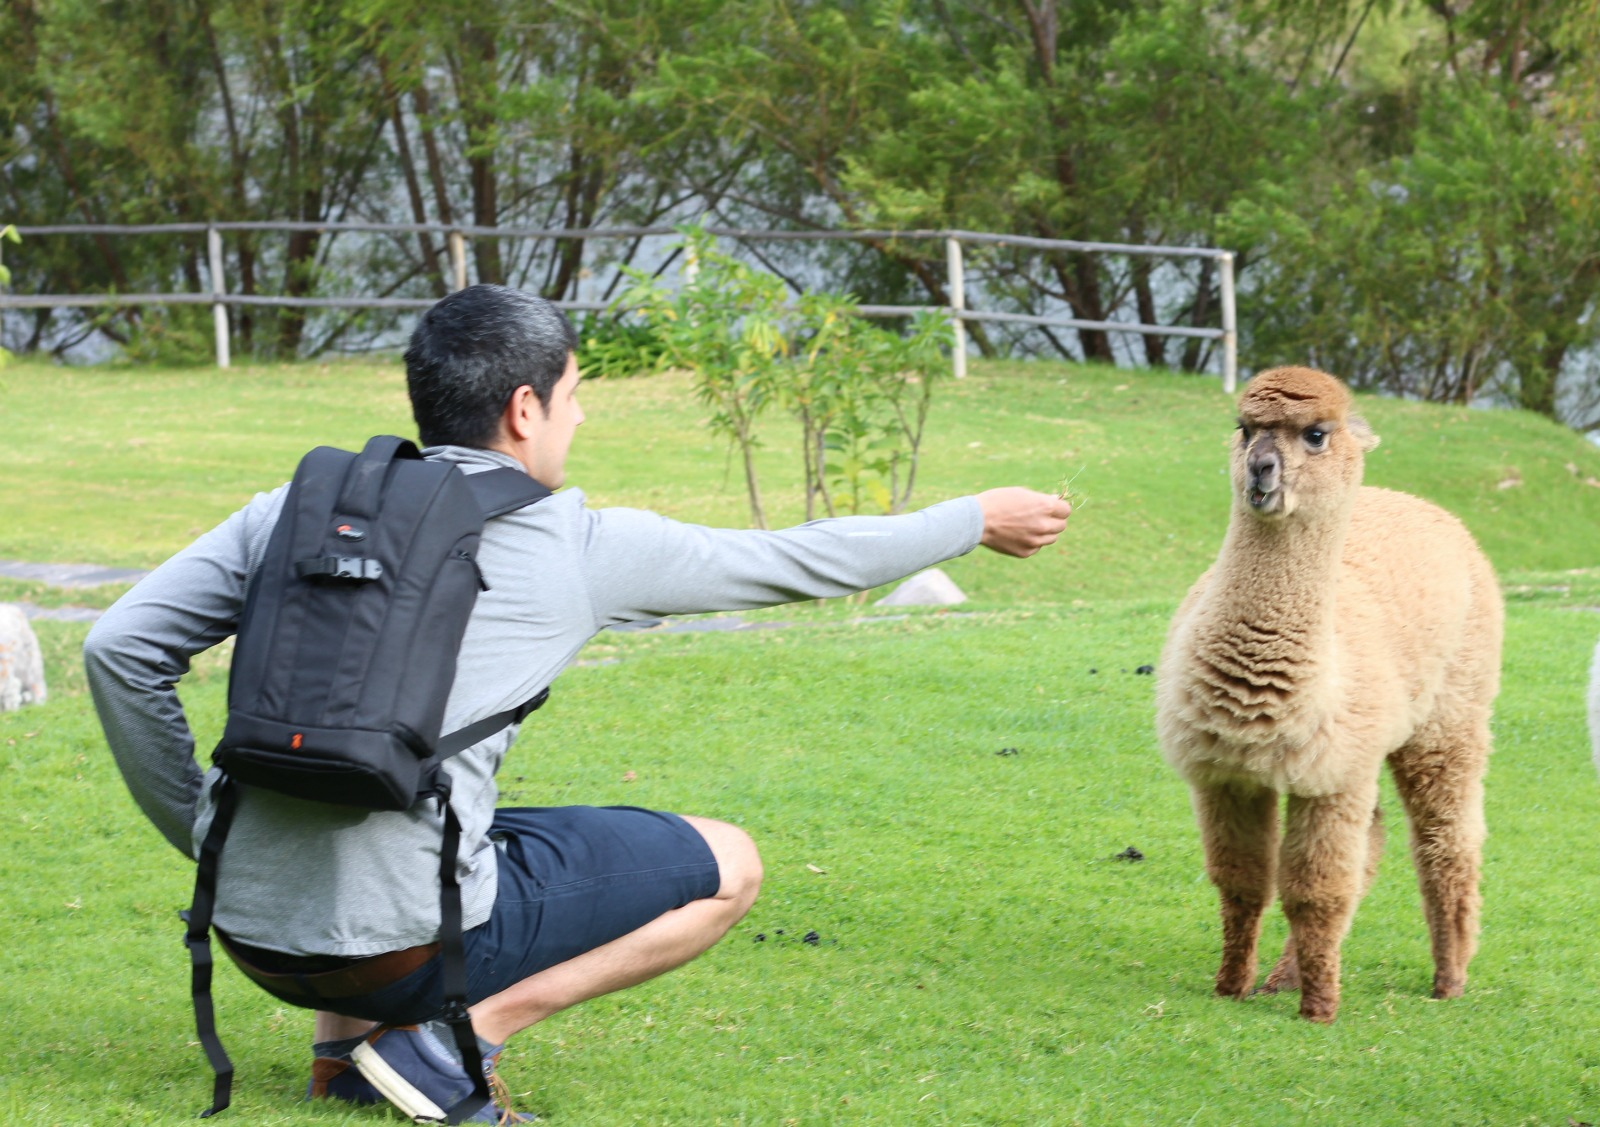 michael-trying-to-pet-alpaca